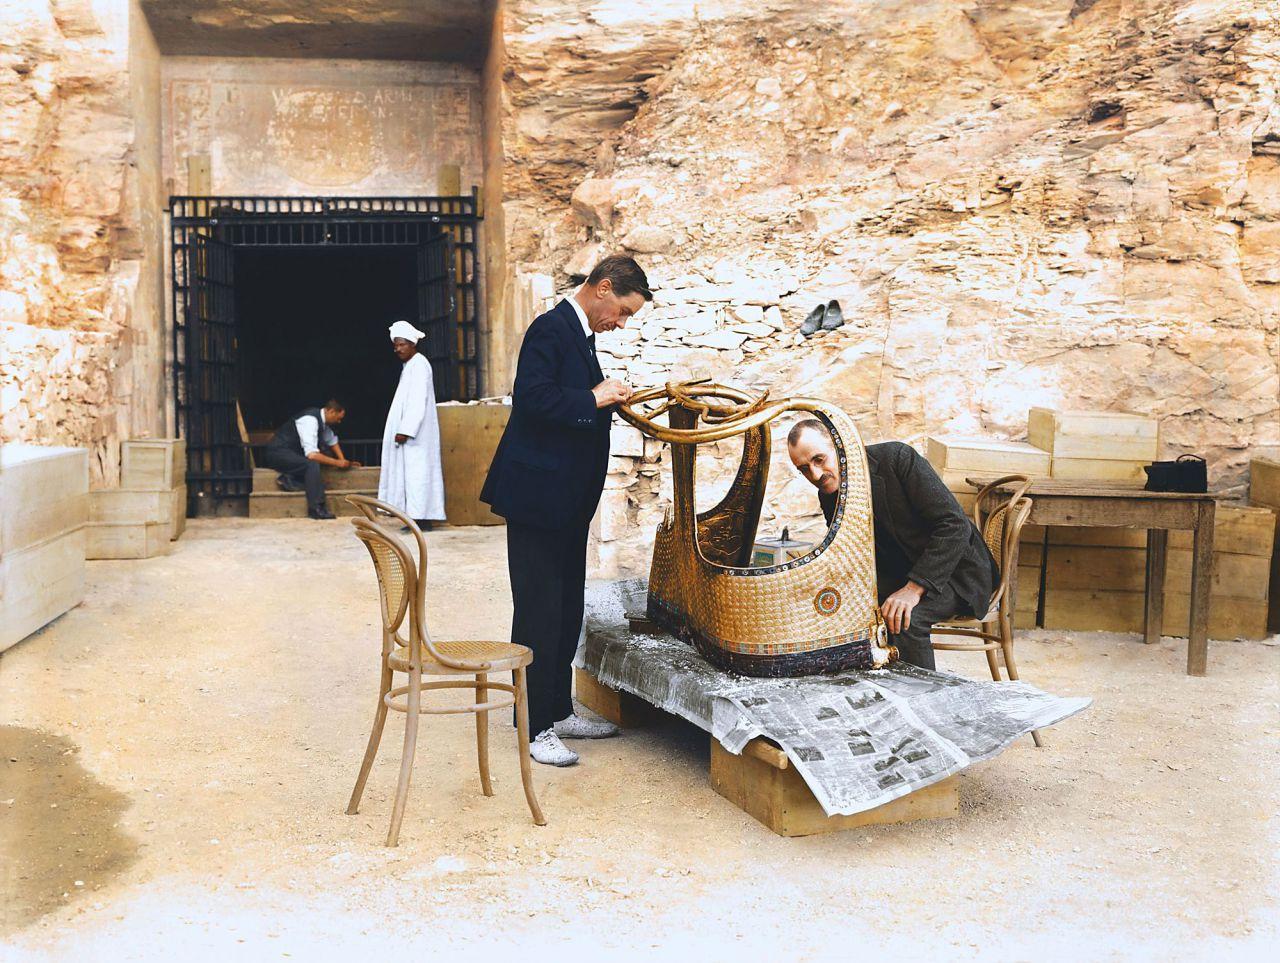 Alfred Lucas y Arthur Mace restaurando la carroza dorada de Tutankhamón.